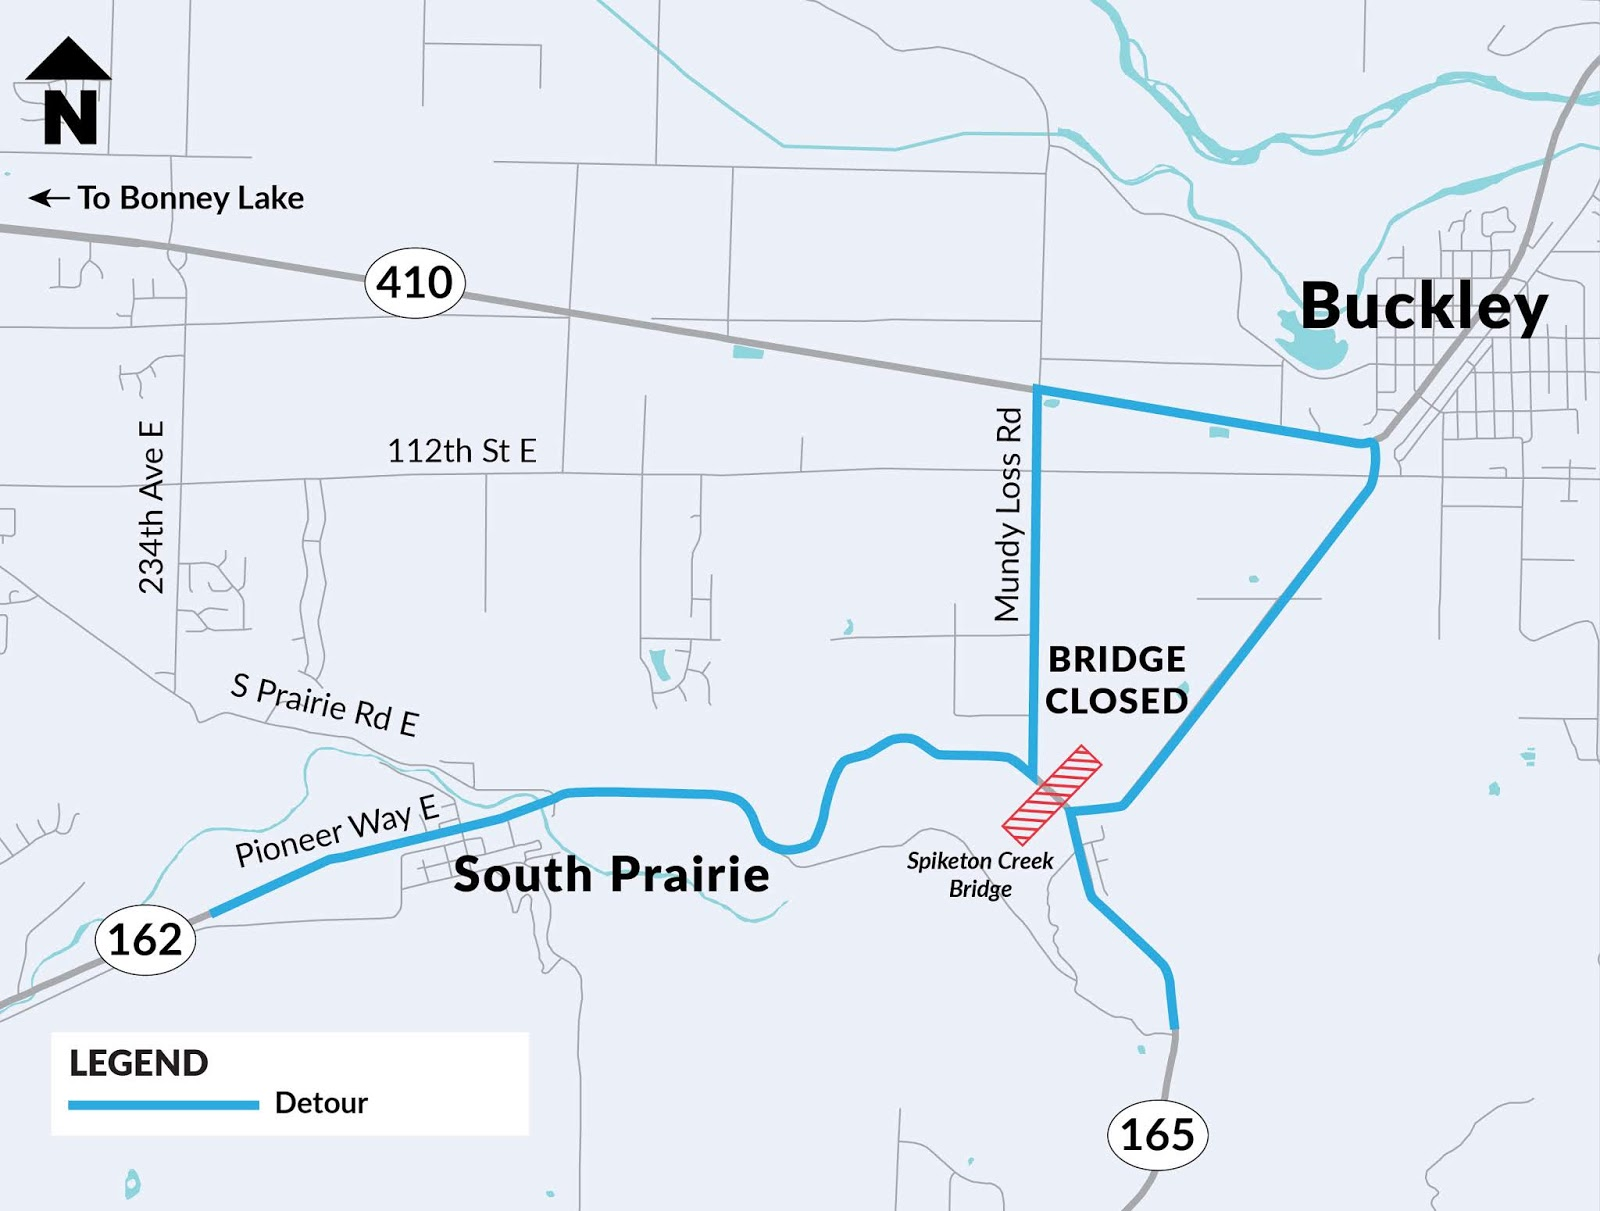 a look at the detour during the spiketon creek bridge closure